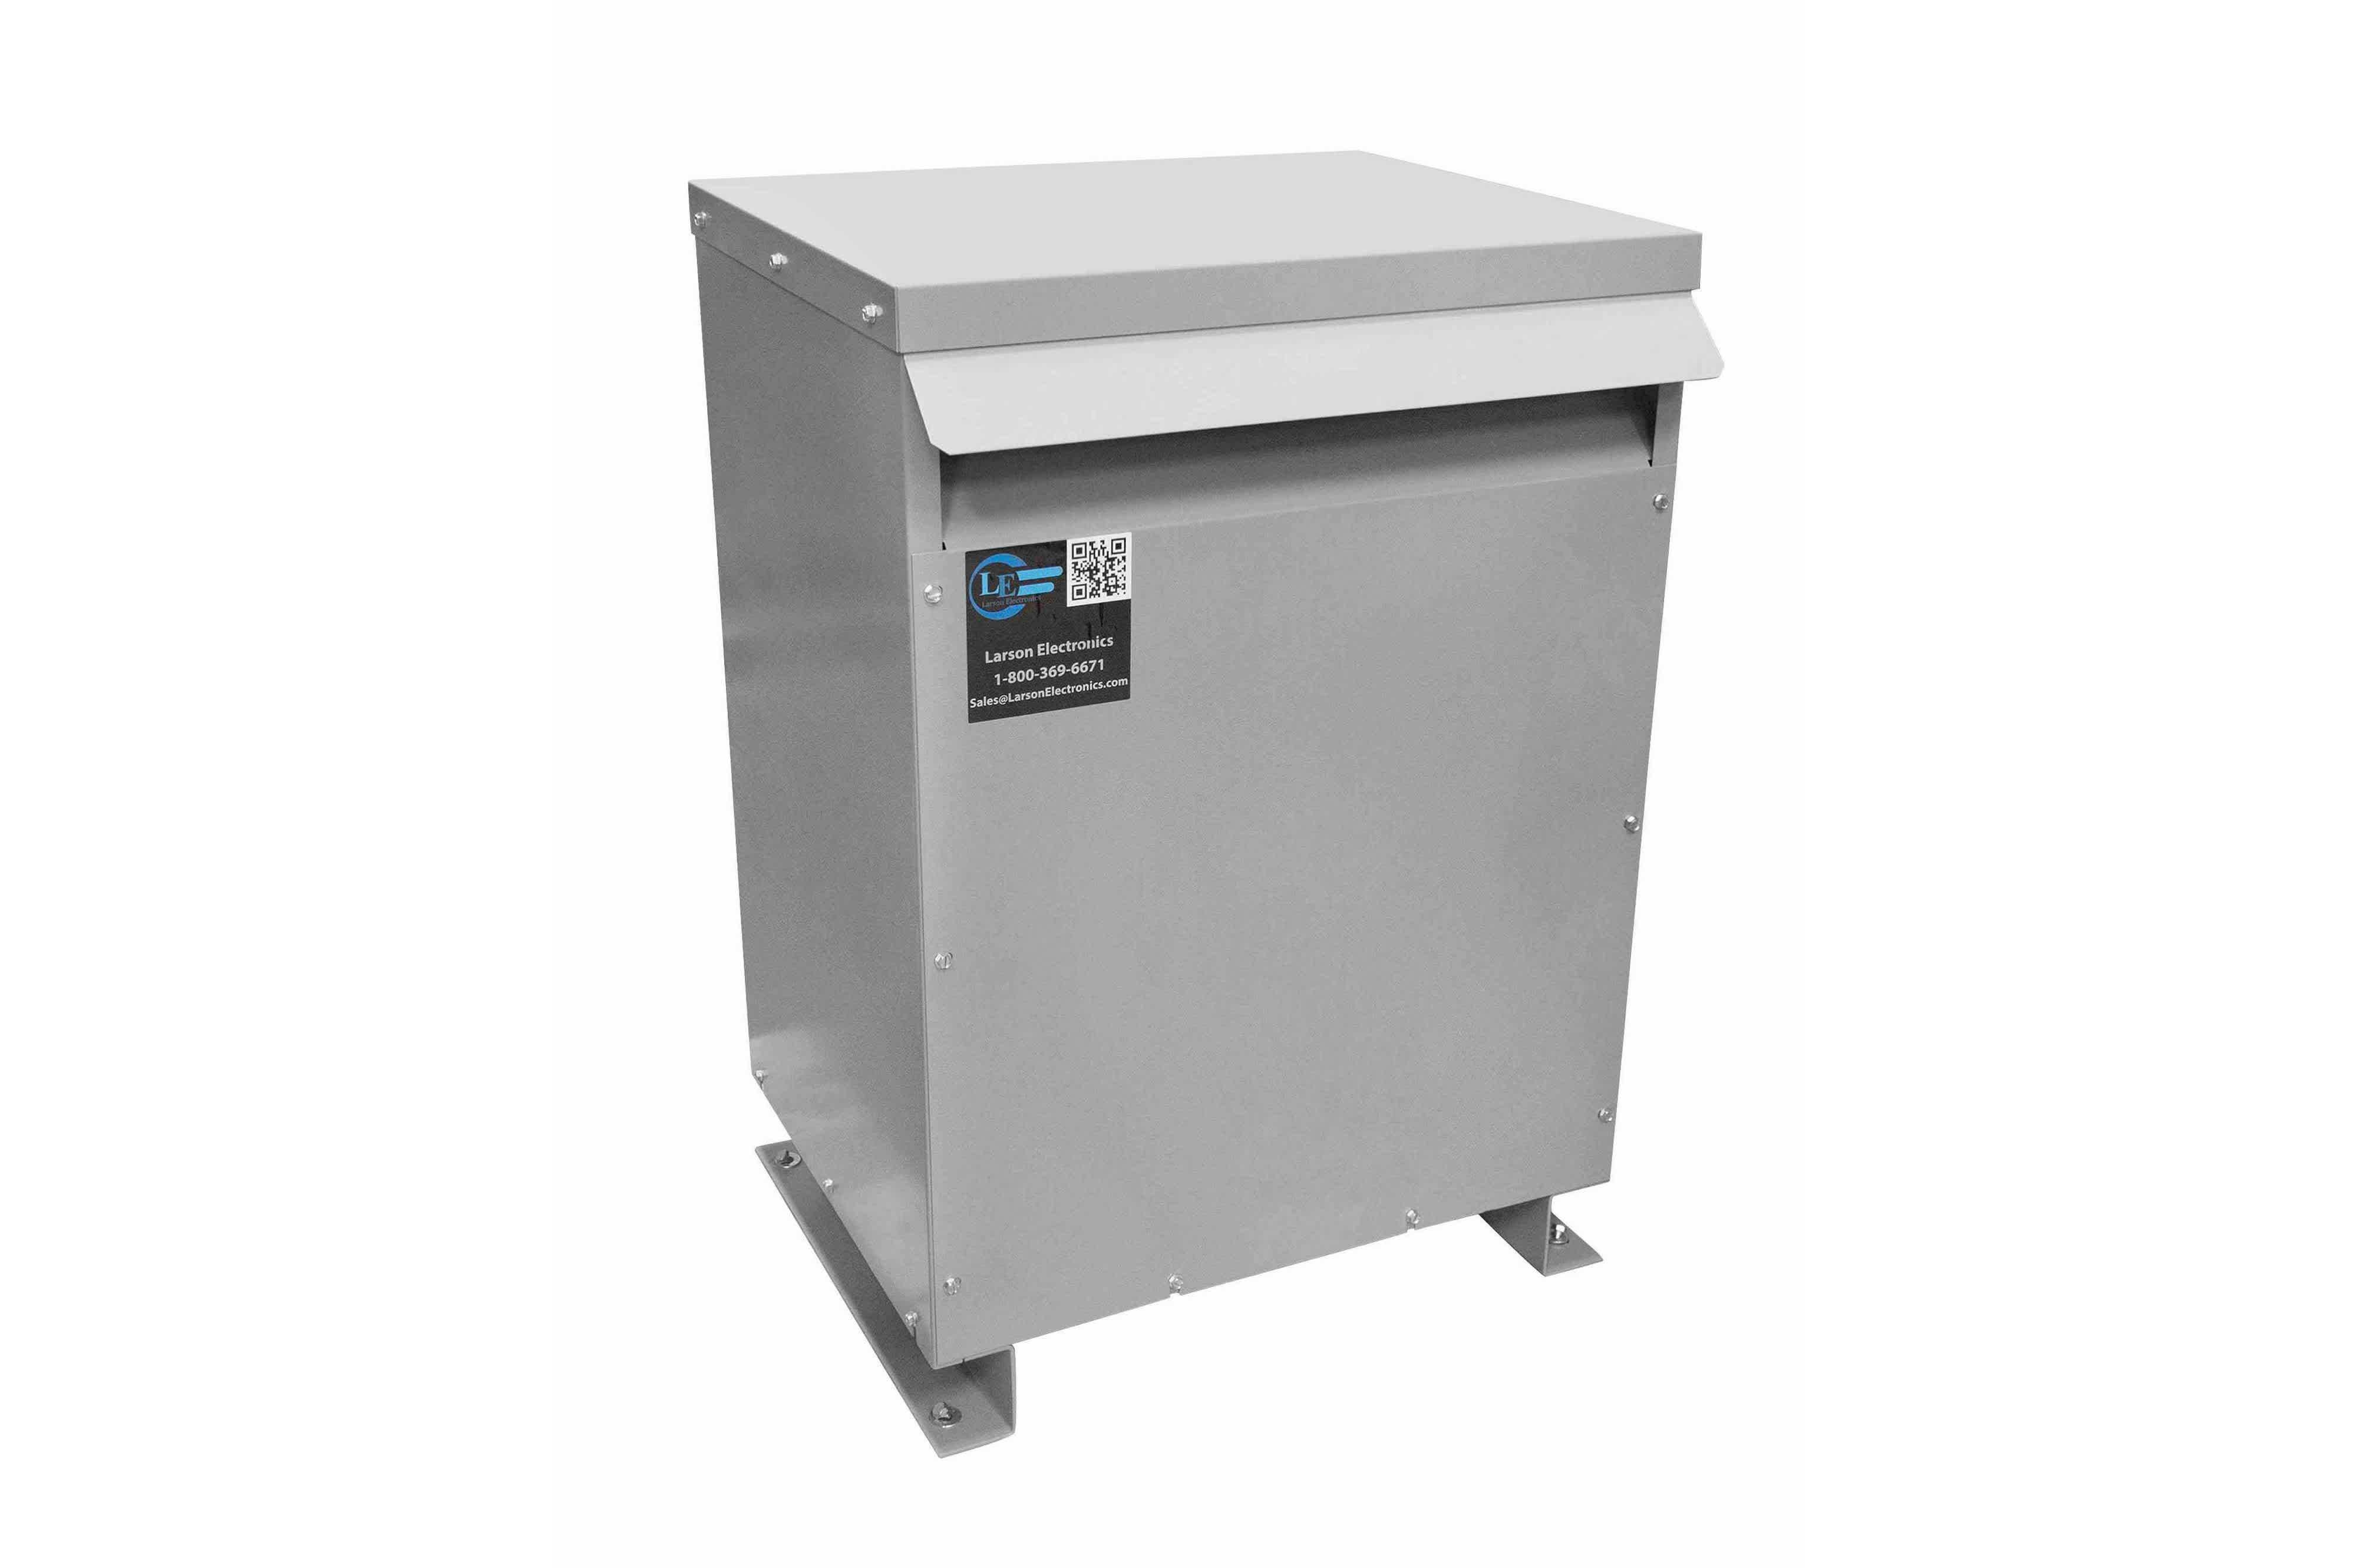 500 kVA 3PH Isolation Transformer, 440V Wye Primary, 208V Delta Secondary, N3R, Ventilated, 60 Hz